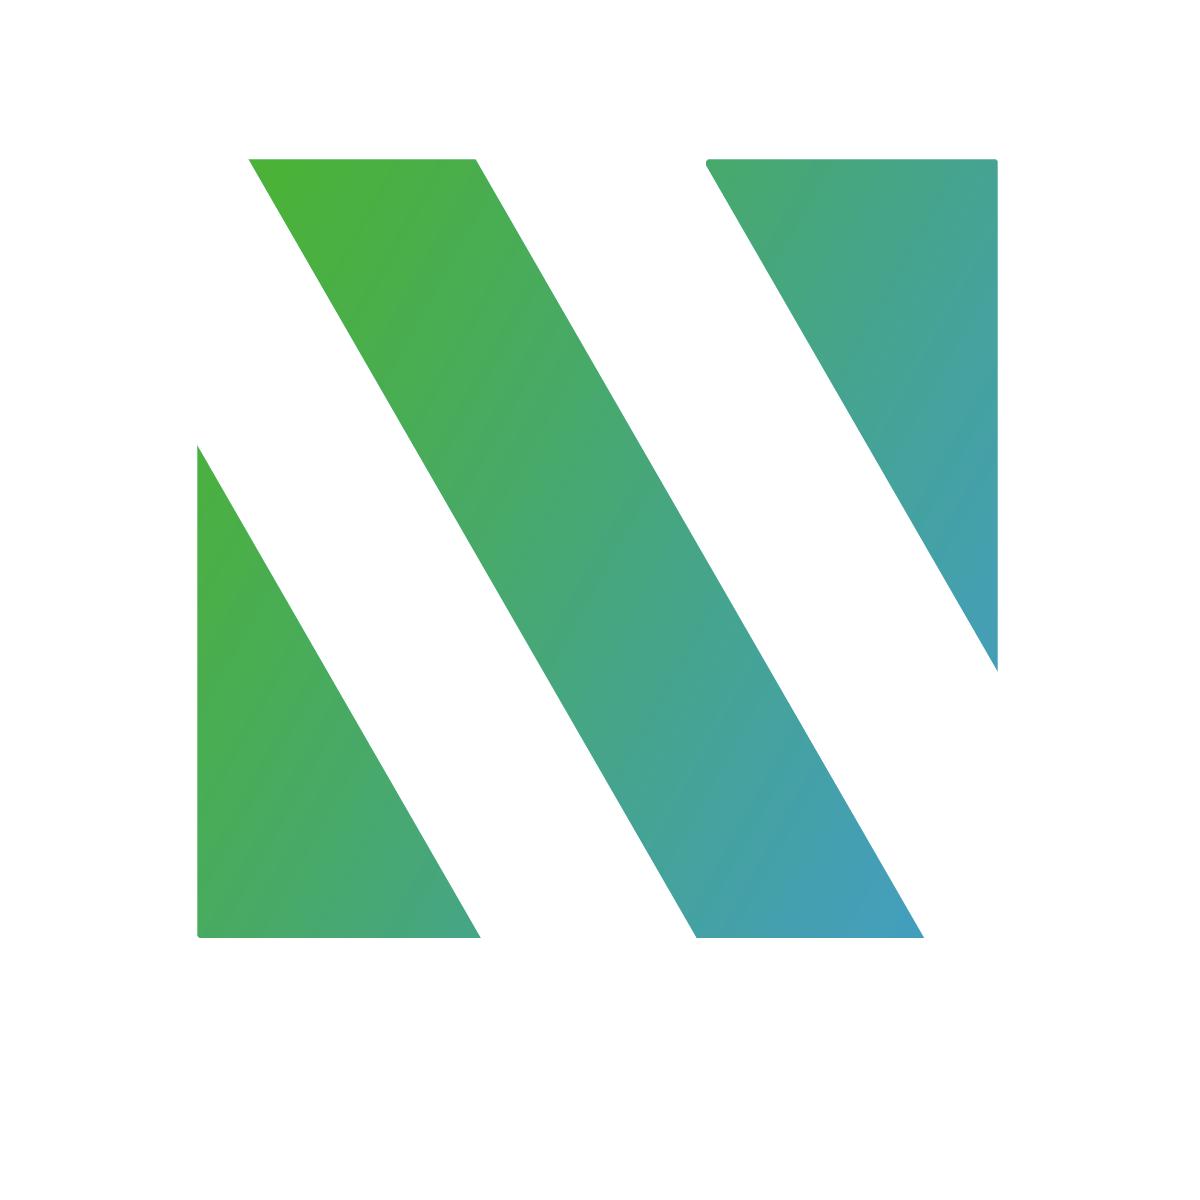 Namacoin logo